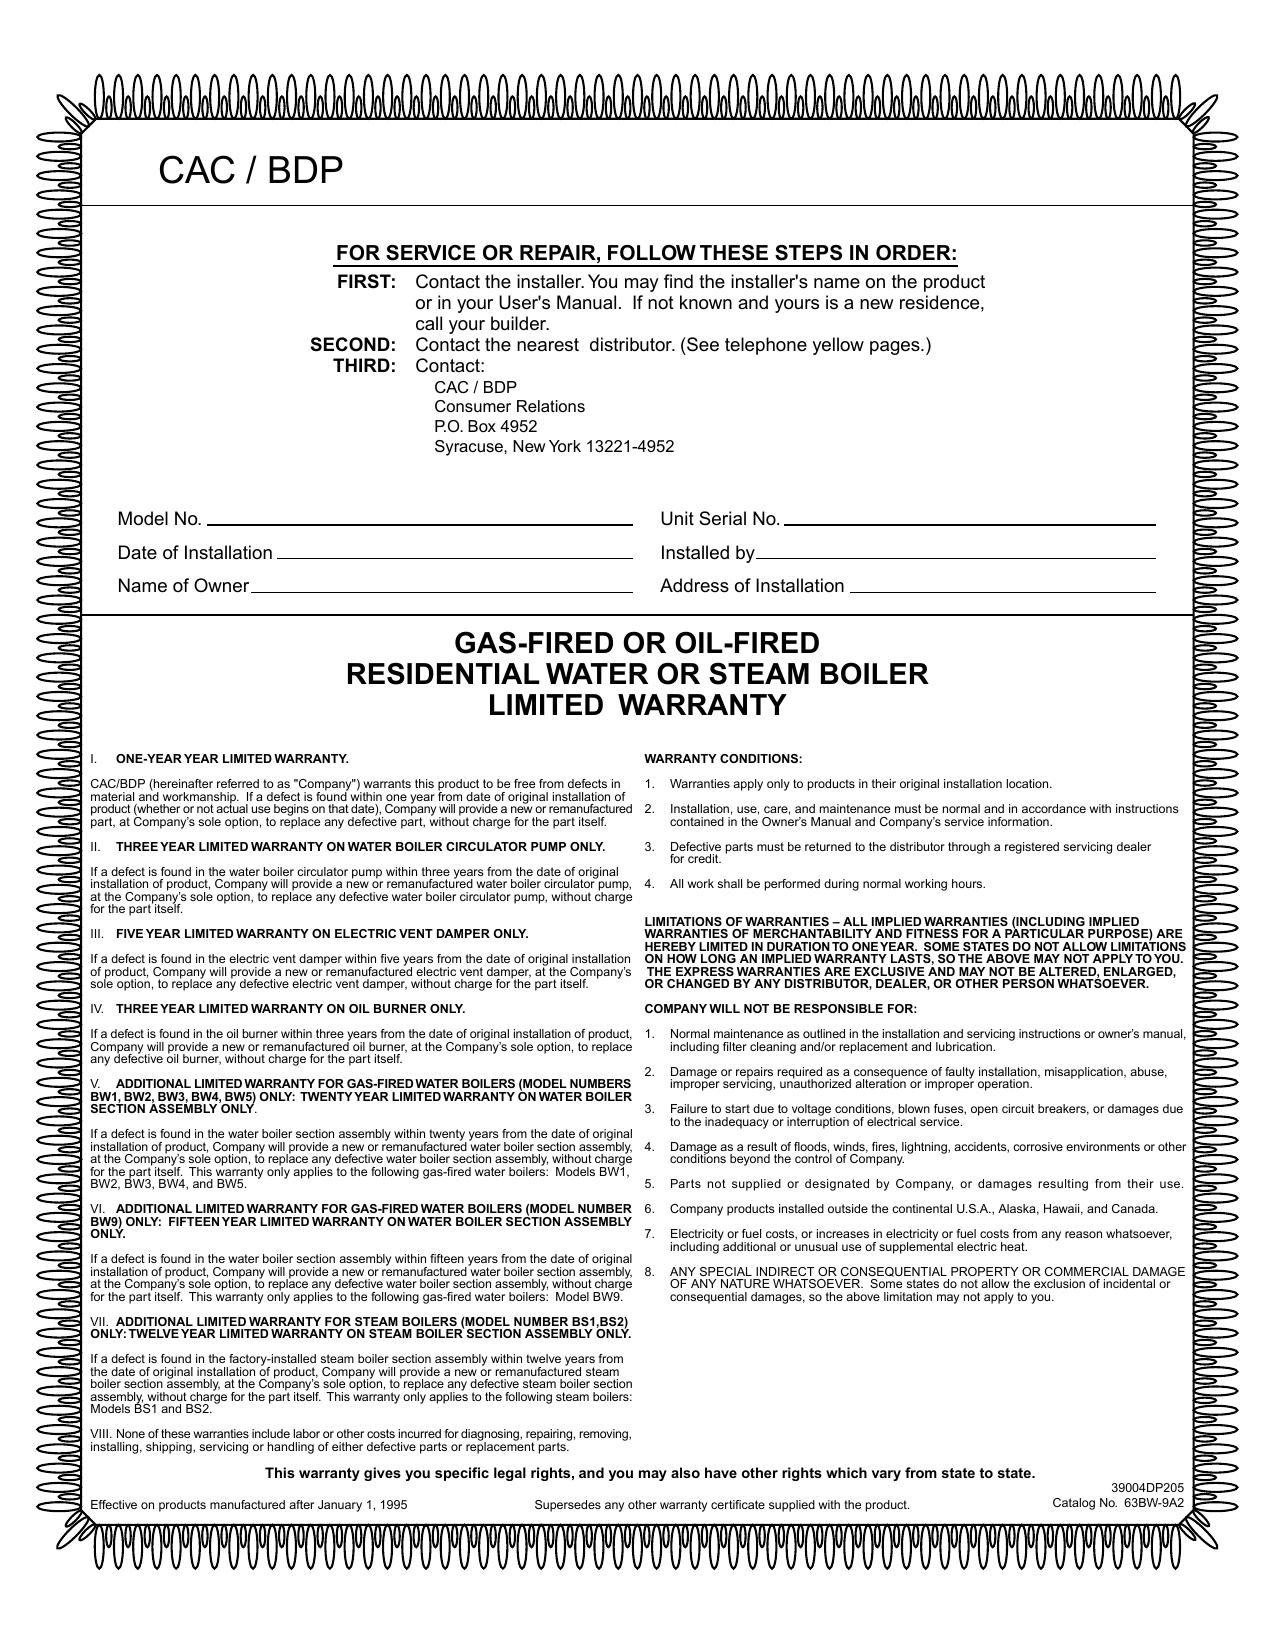 Cac Bdp Hvacpartners Manualzz